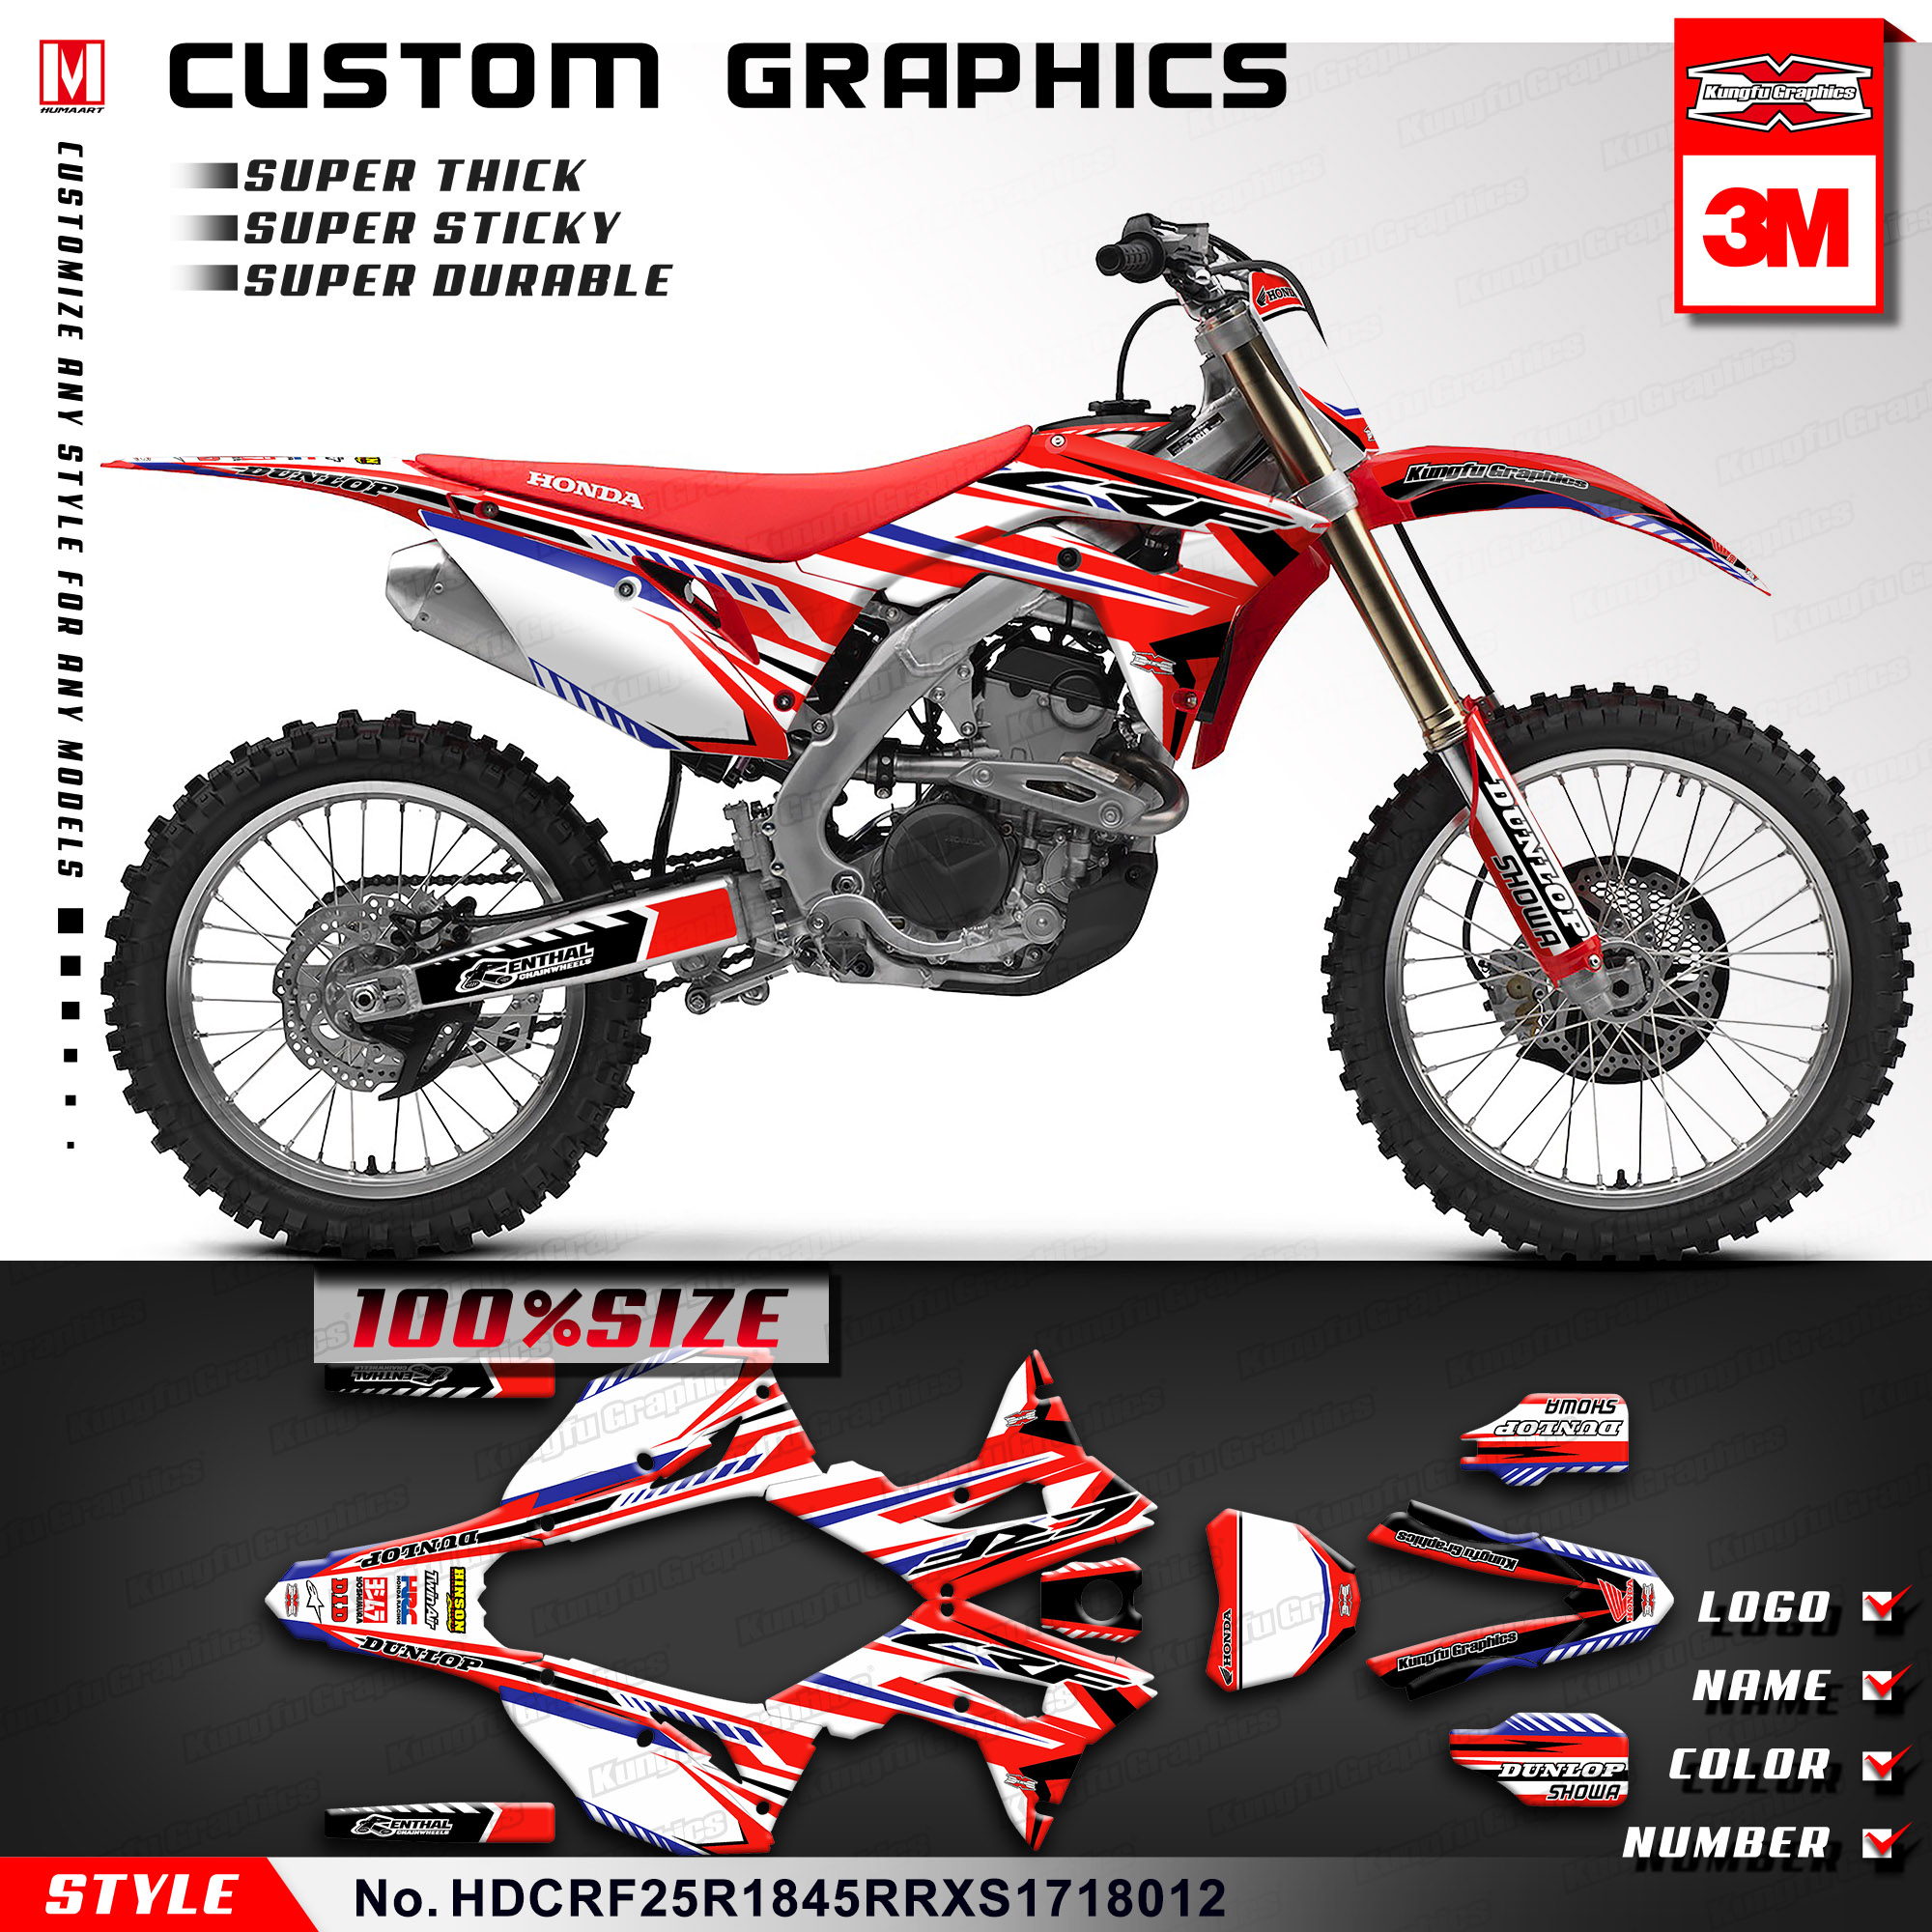 Kungfu graphics custom vinyl wrap motorcycle dirt bike stickers decal kit for honda crf250r crf450r crf450rx supermoto 2017 2018